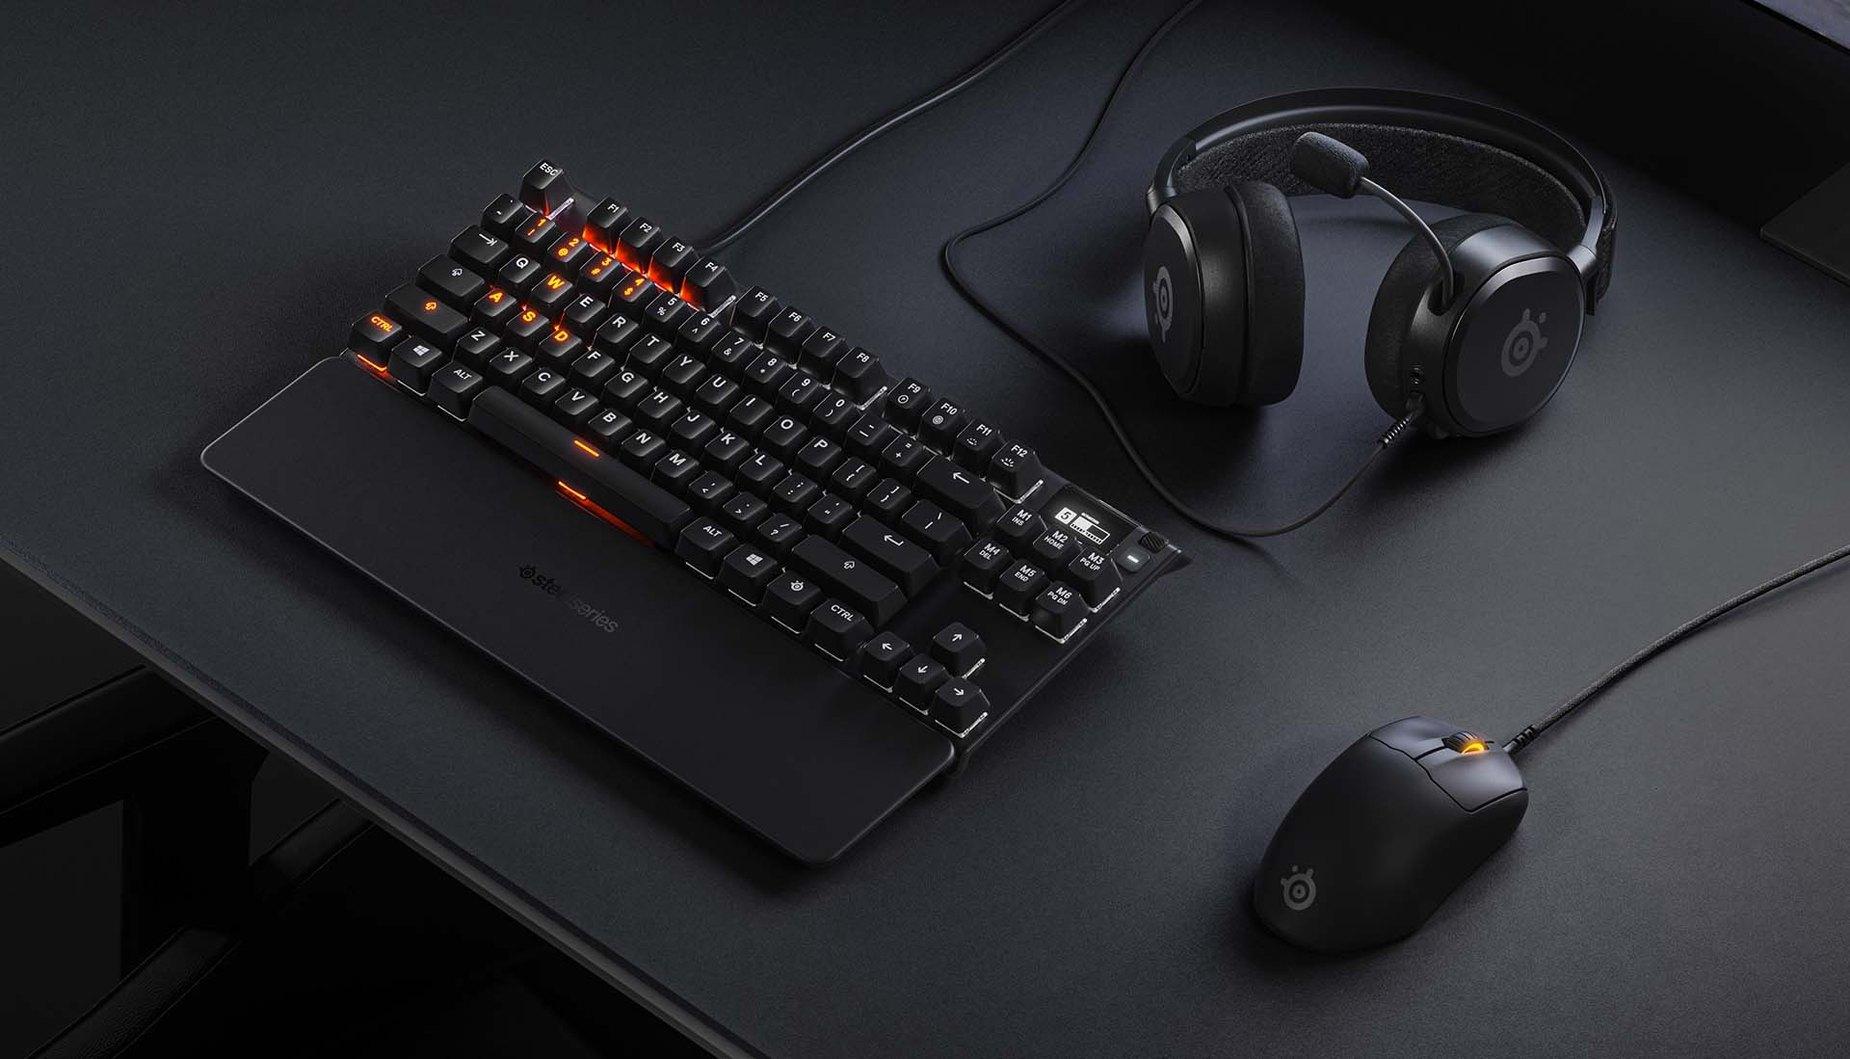 Overhead view of Prime Mini mouse sitting beside a sleek SteelSeries keyboard.